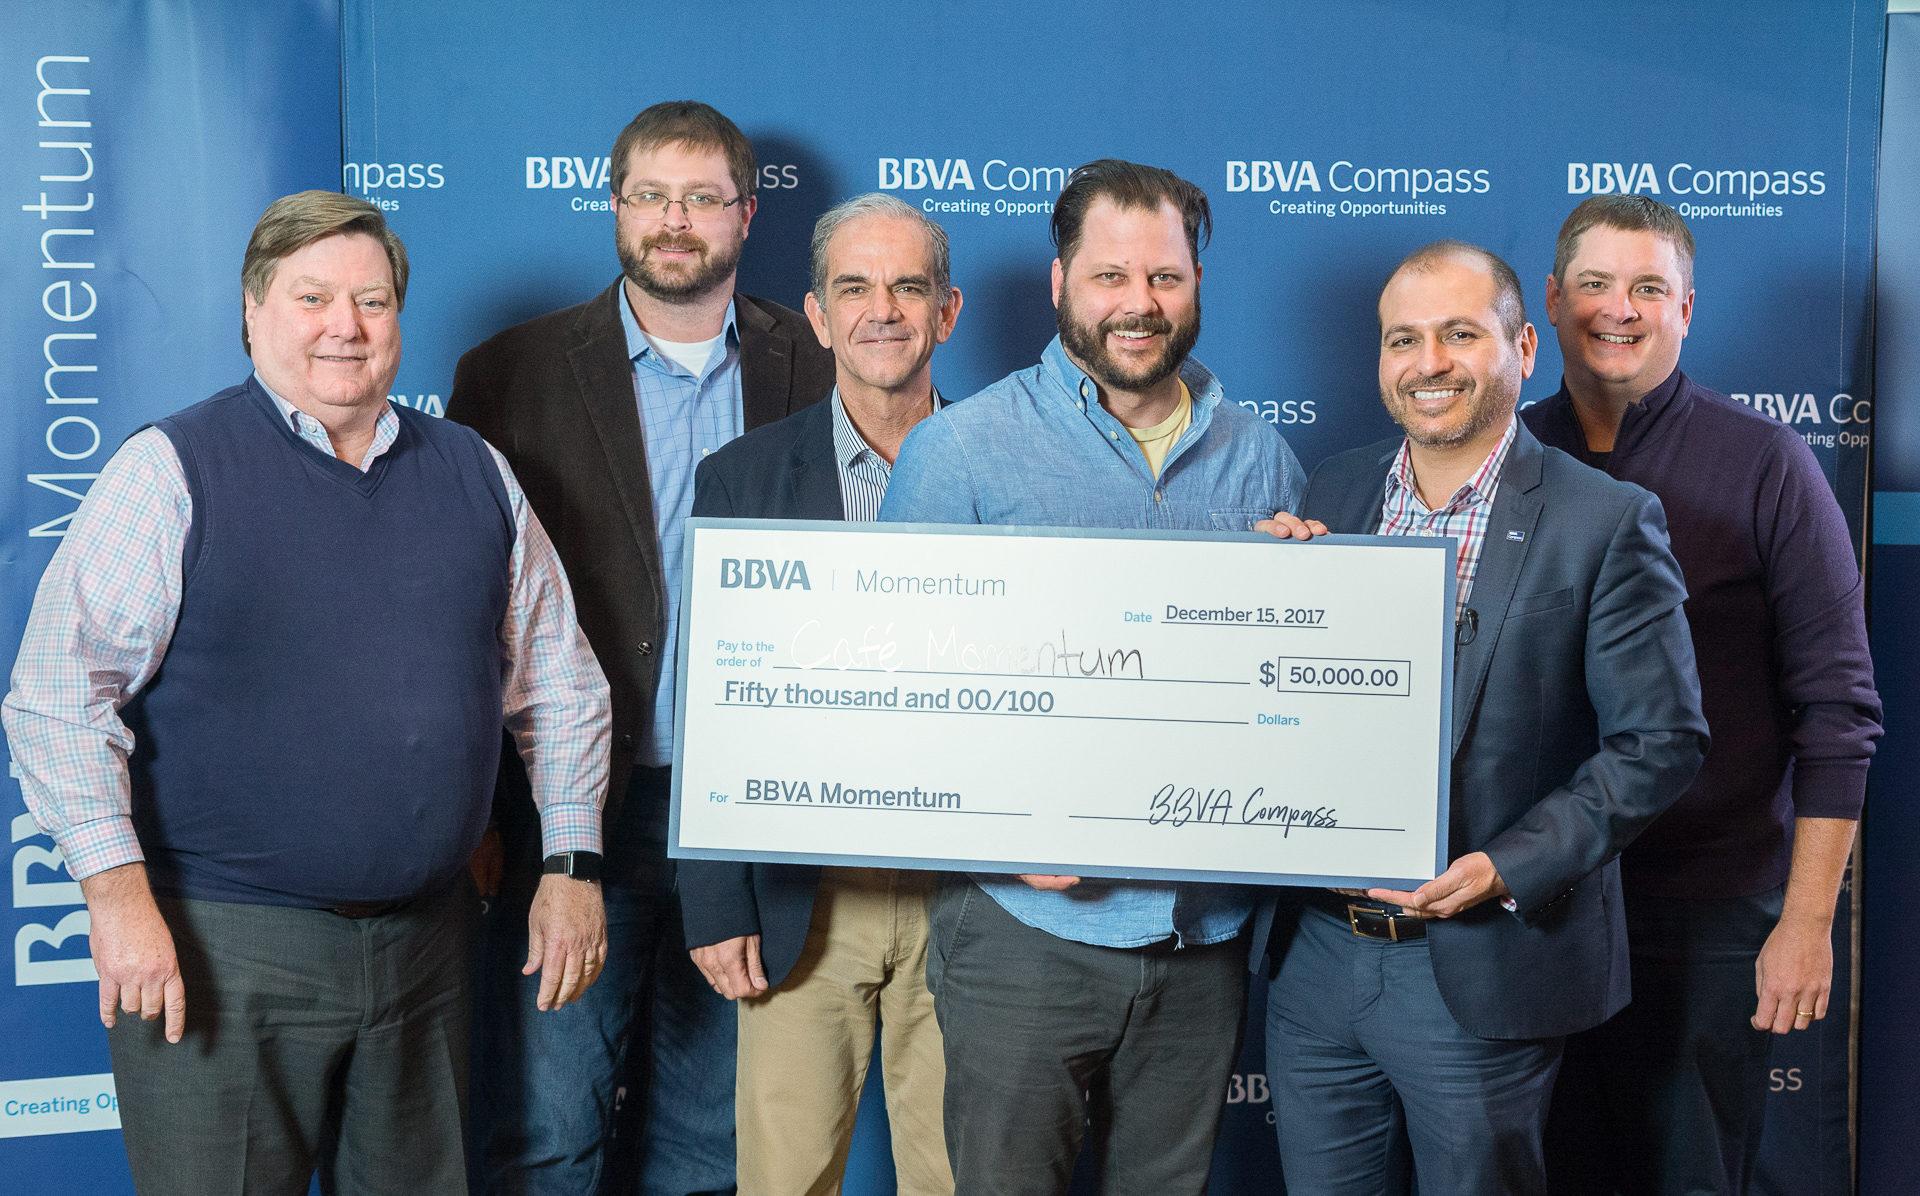 Dallas-based social entrepreneur takes home $50,000 prize as BBVA ...